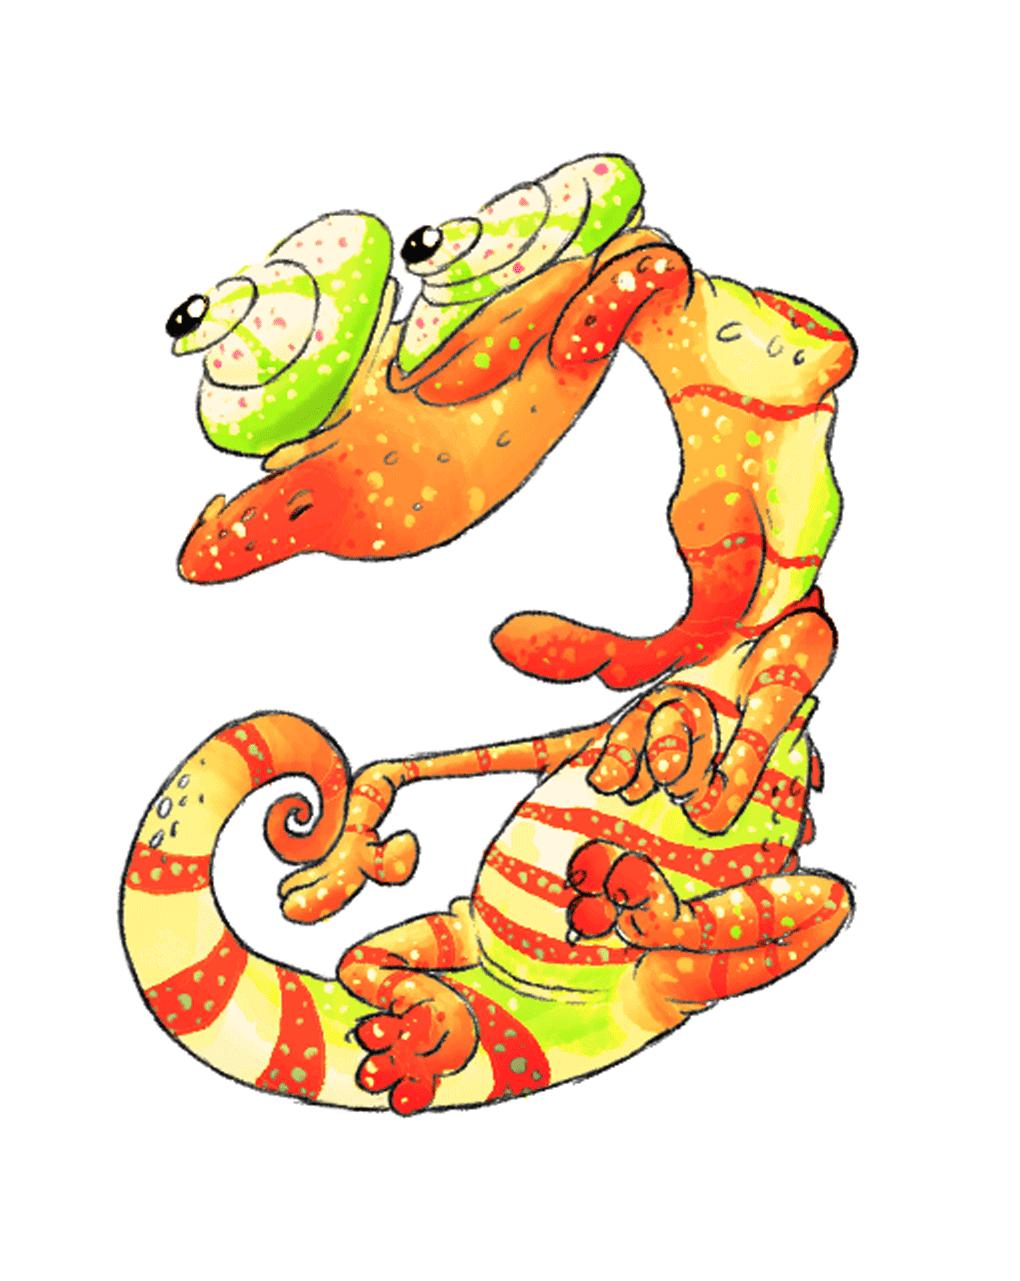 Fruit Smoothie Chameleon